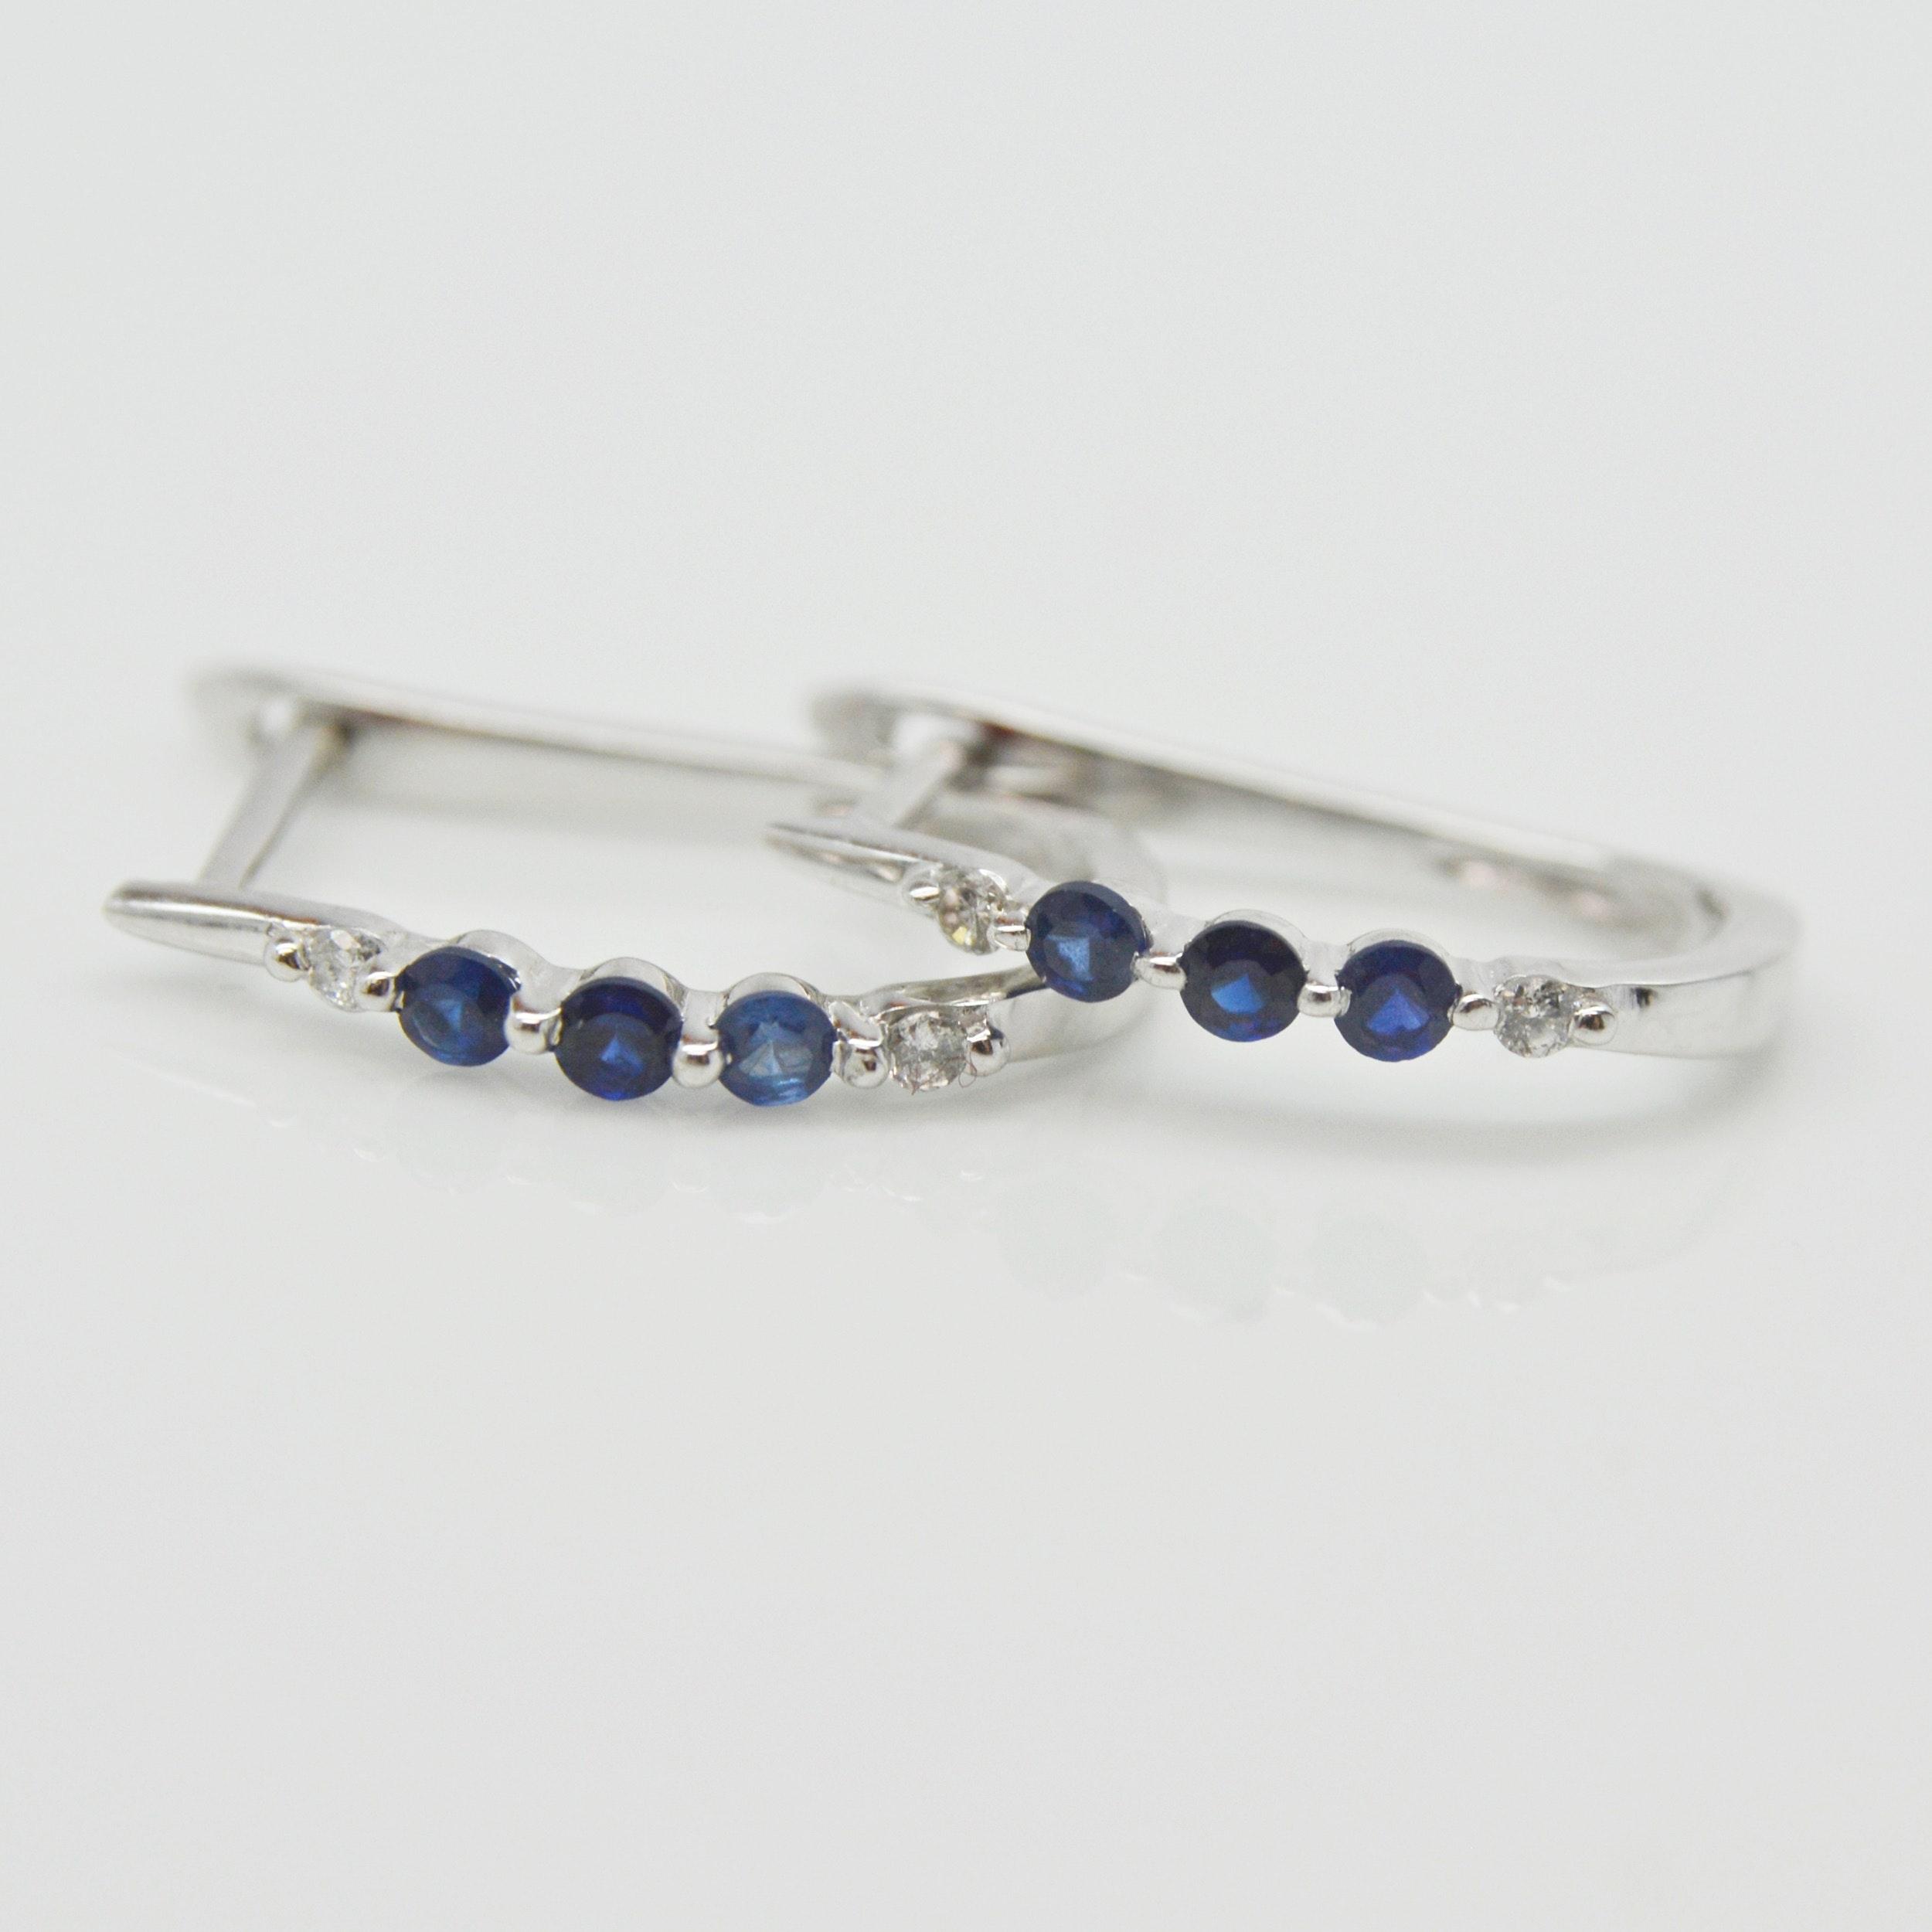 14K White Gold Sapphire and Diamond Hoop Earrings